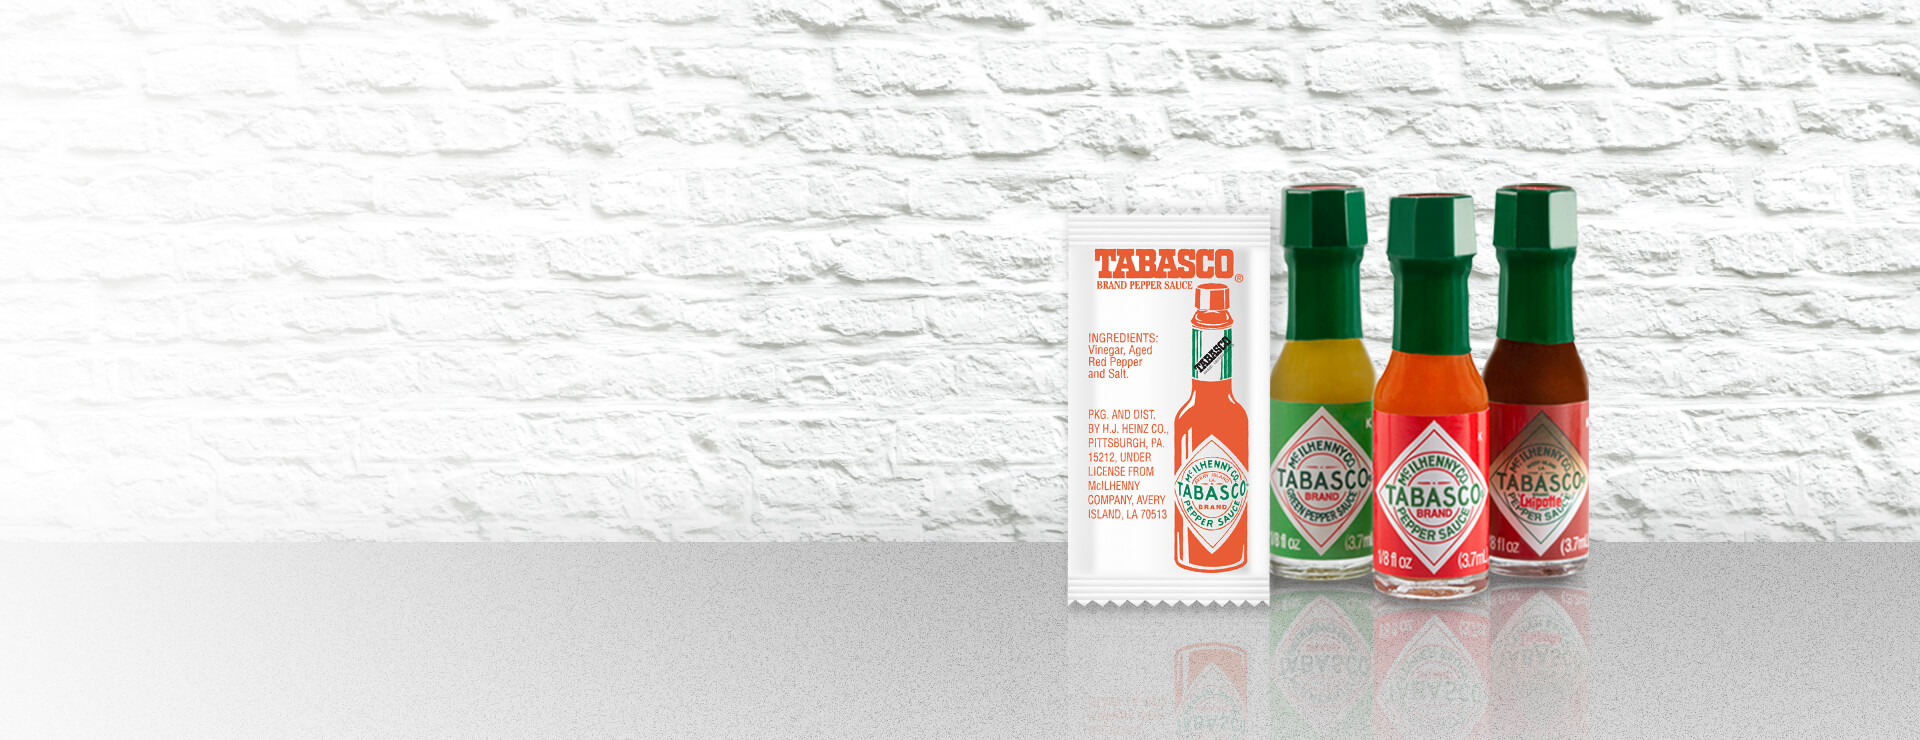 Tabasco Brand Portion Control Formats